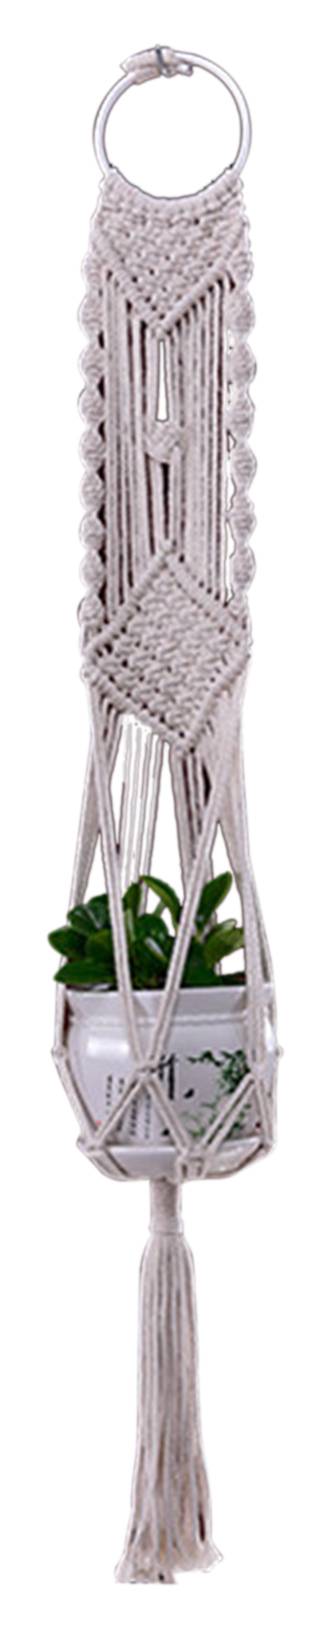 Macrame Plant Hanger with Tassels Woven Decorative Flower Pot Holder Indoor Outdoor Hanging Planter Basket Handmade Cotton Rope Home Garden